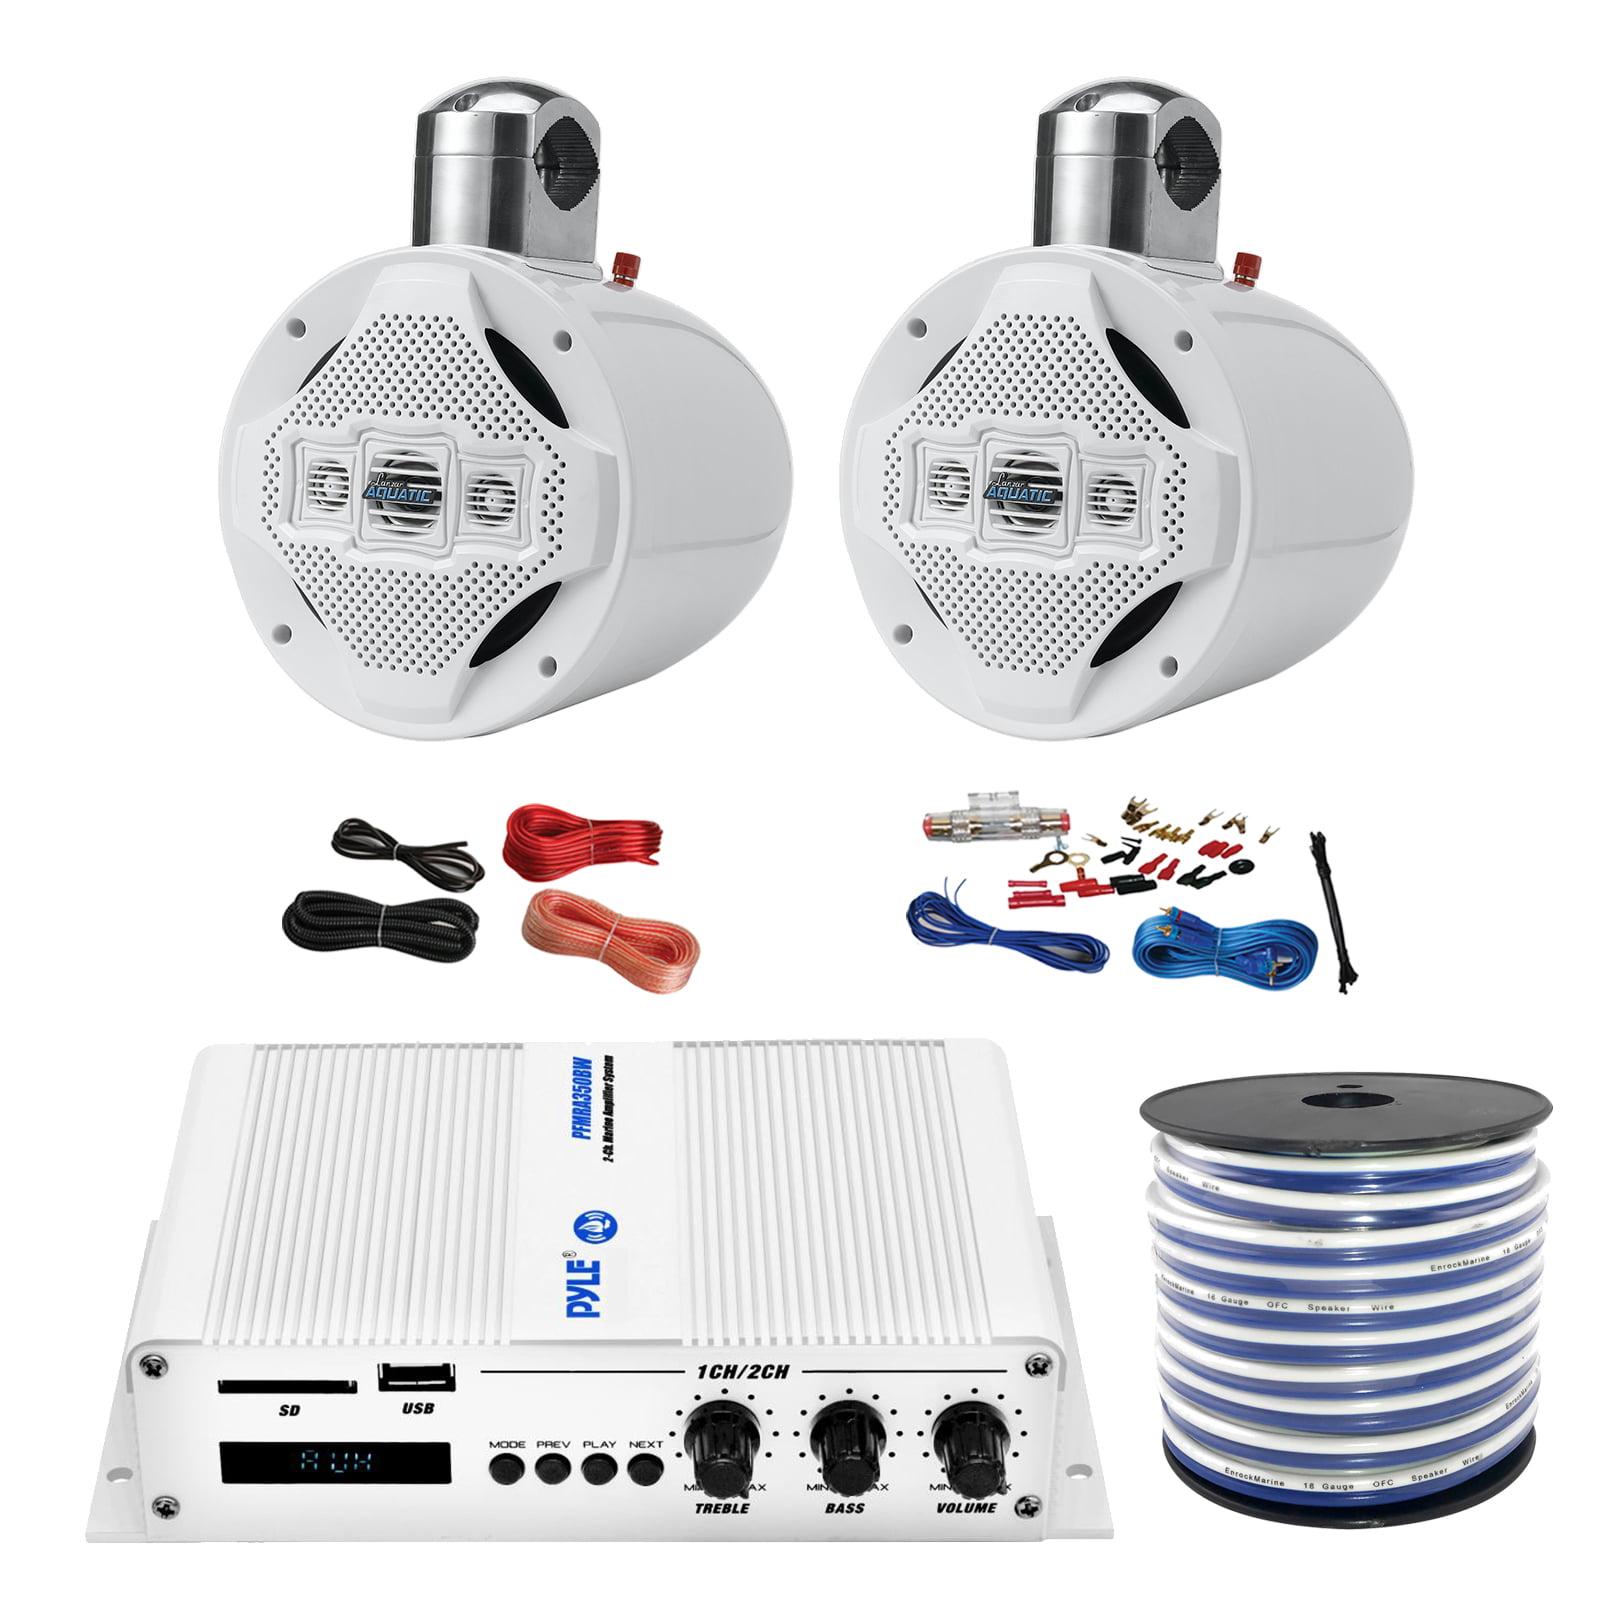 "Pyle PFMRA350BW 2-Channel Bridgeable 200 Watts RMS Marine Amplifier, 2x Lanzar AQWB8W 8"" 4 Way 1,200 Watts Wake Board Tower Speakers - White, Pyle 8 Gauge Amp Install Kit, Enrock 18g Speaker Wire"